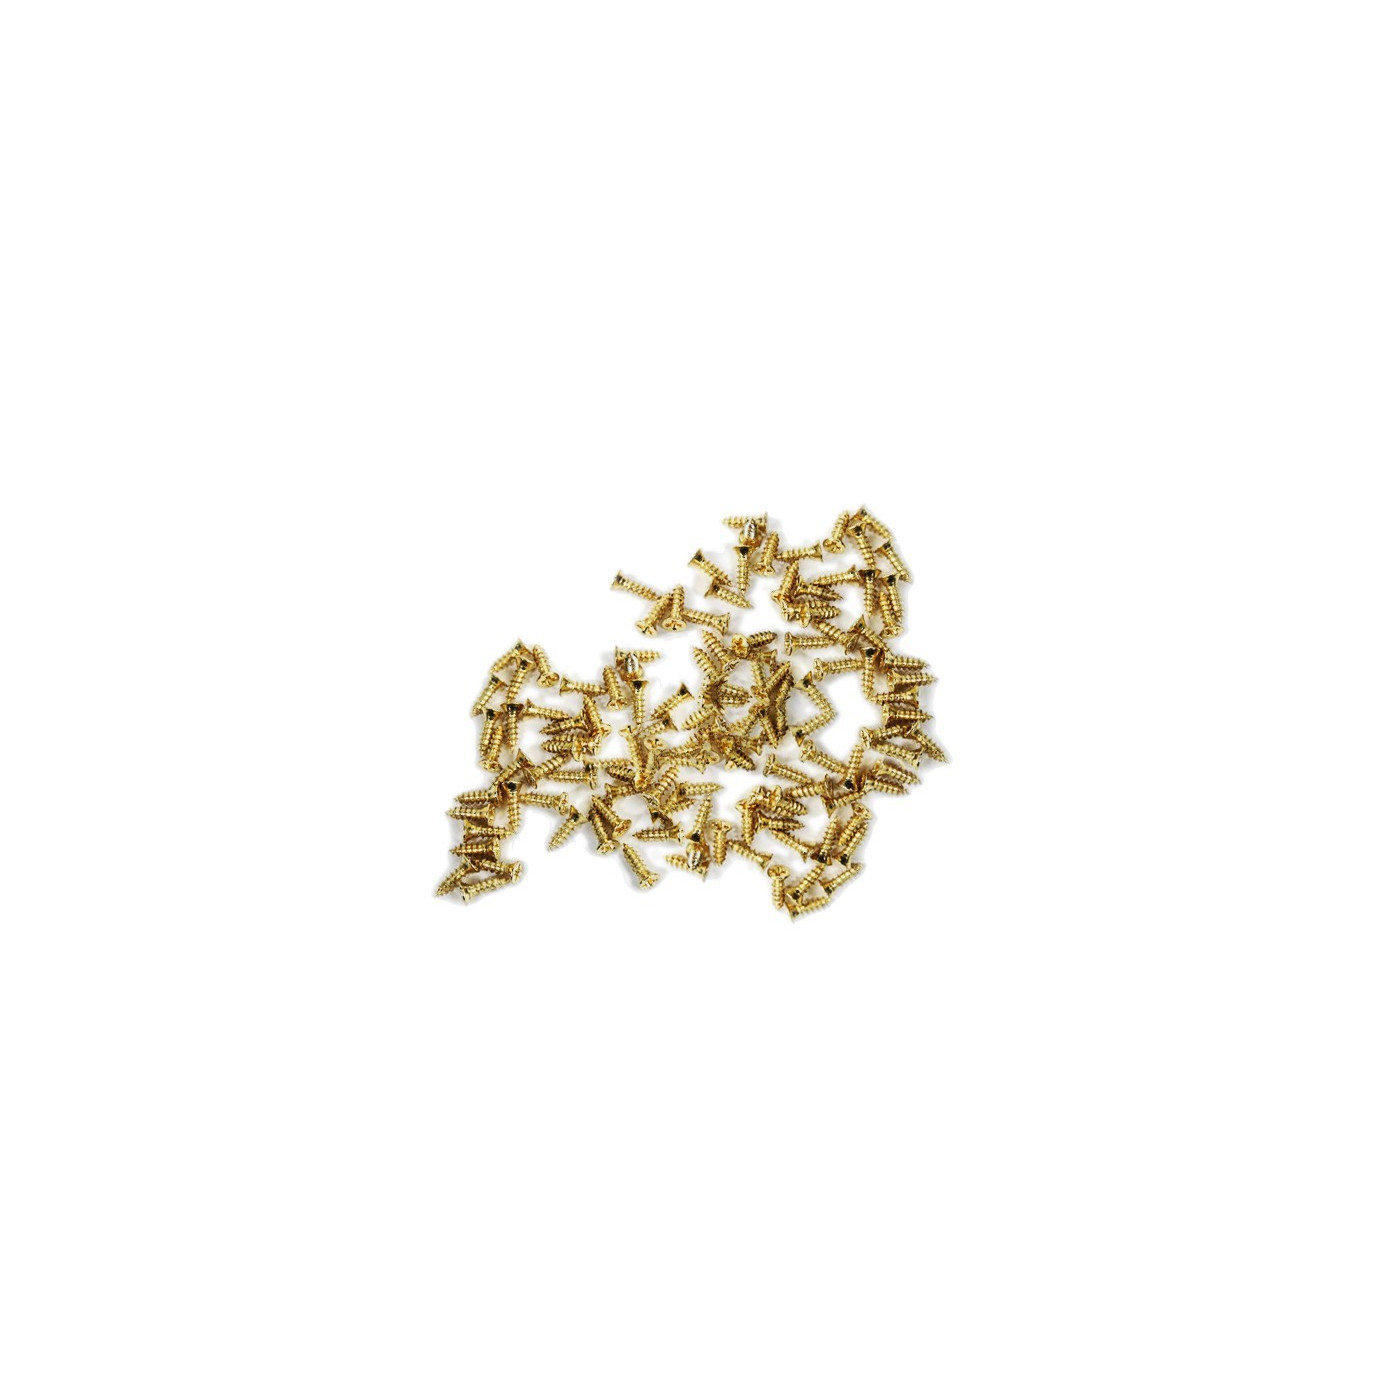 100 mini screws (2.0x8 mm, countersunk, gold color)